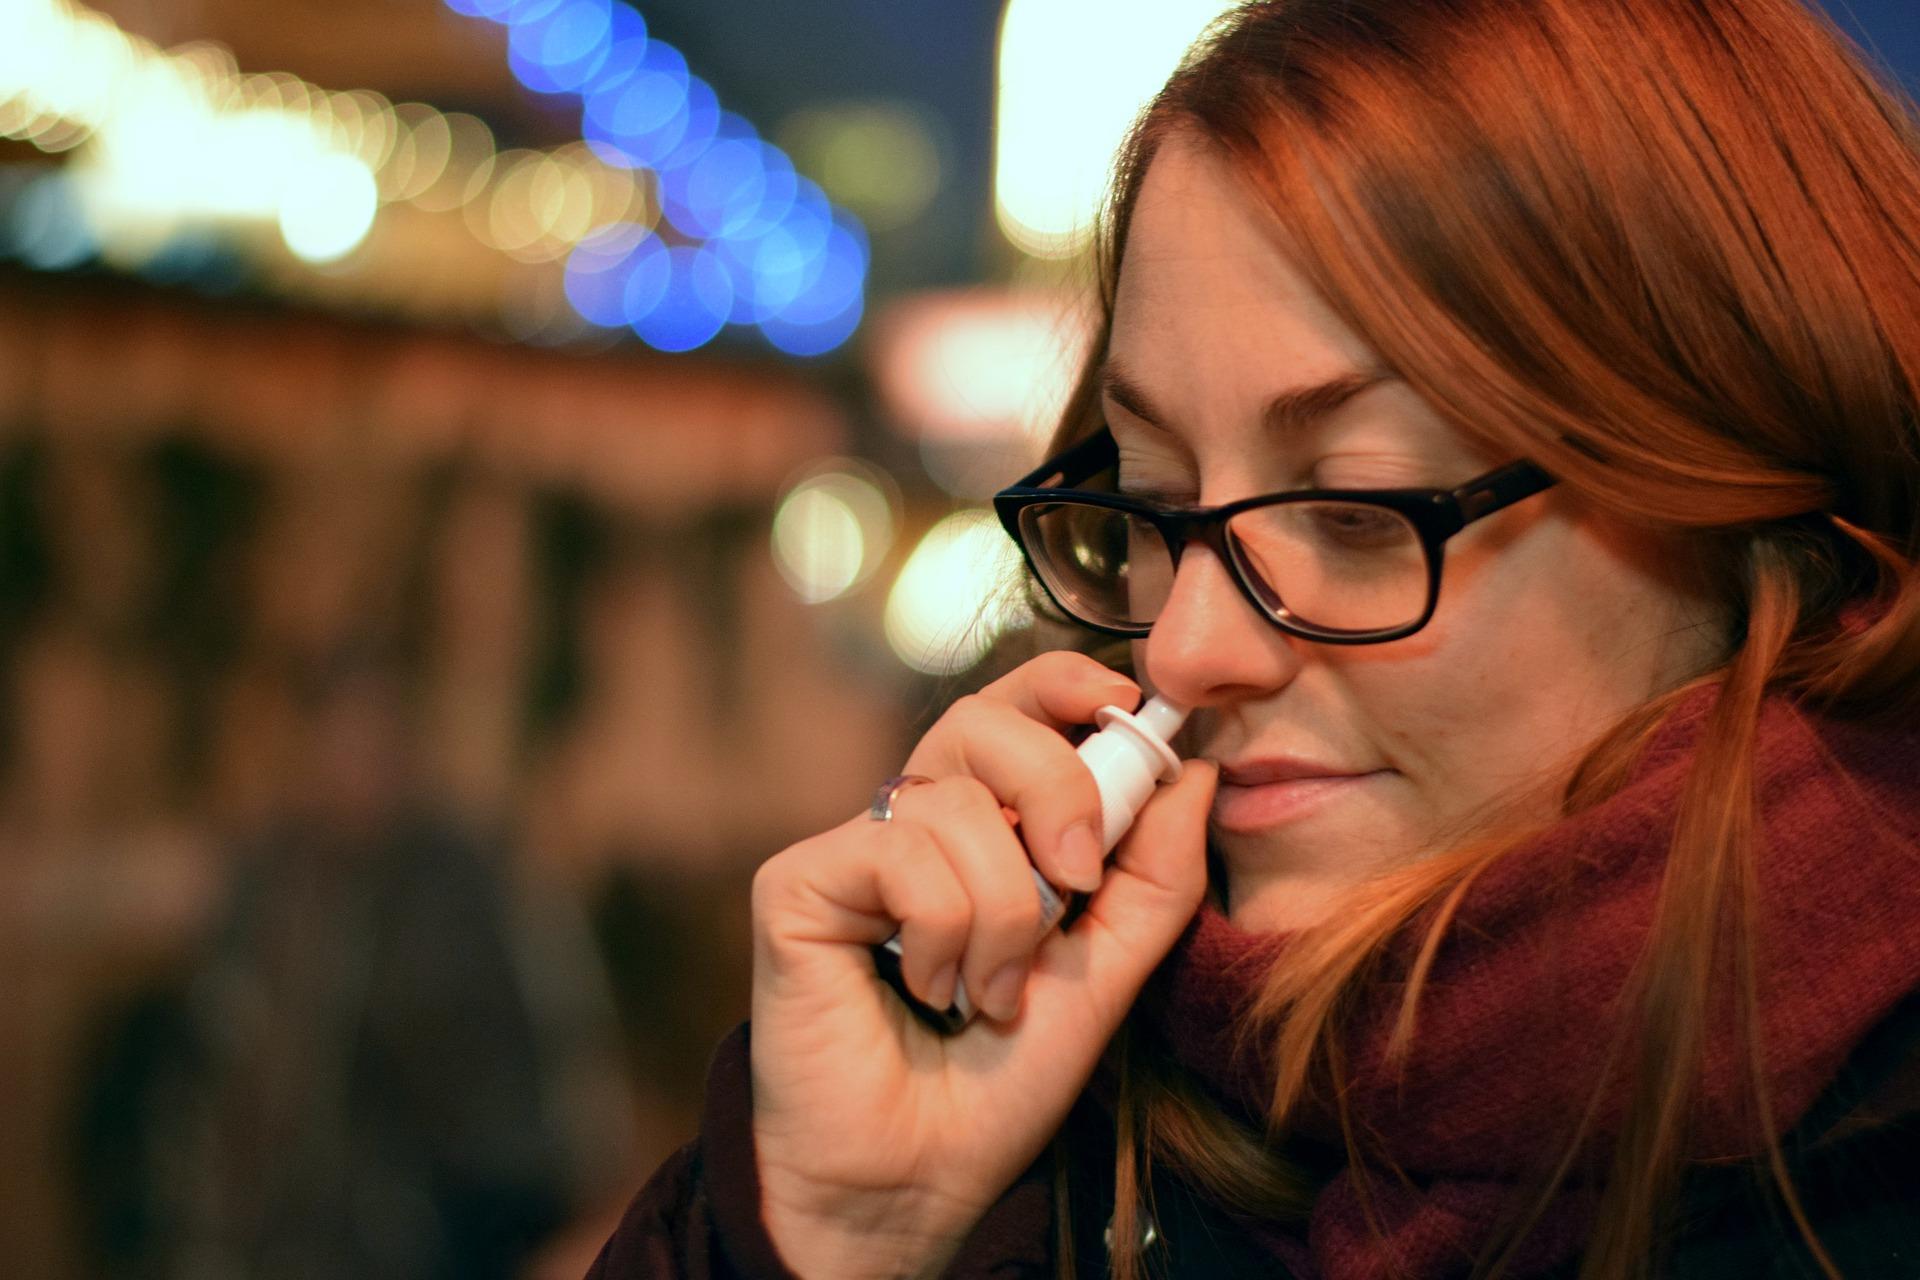 nasal spray human-3269822_1920